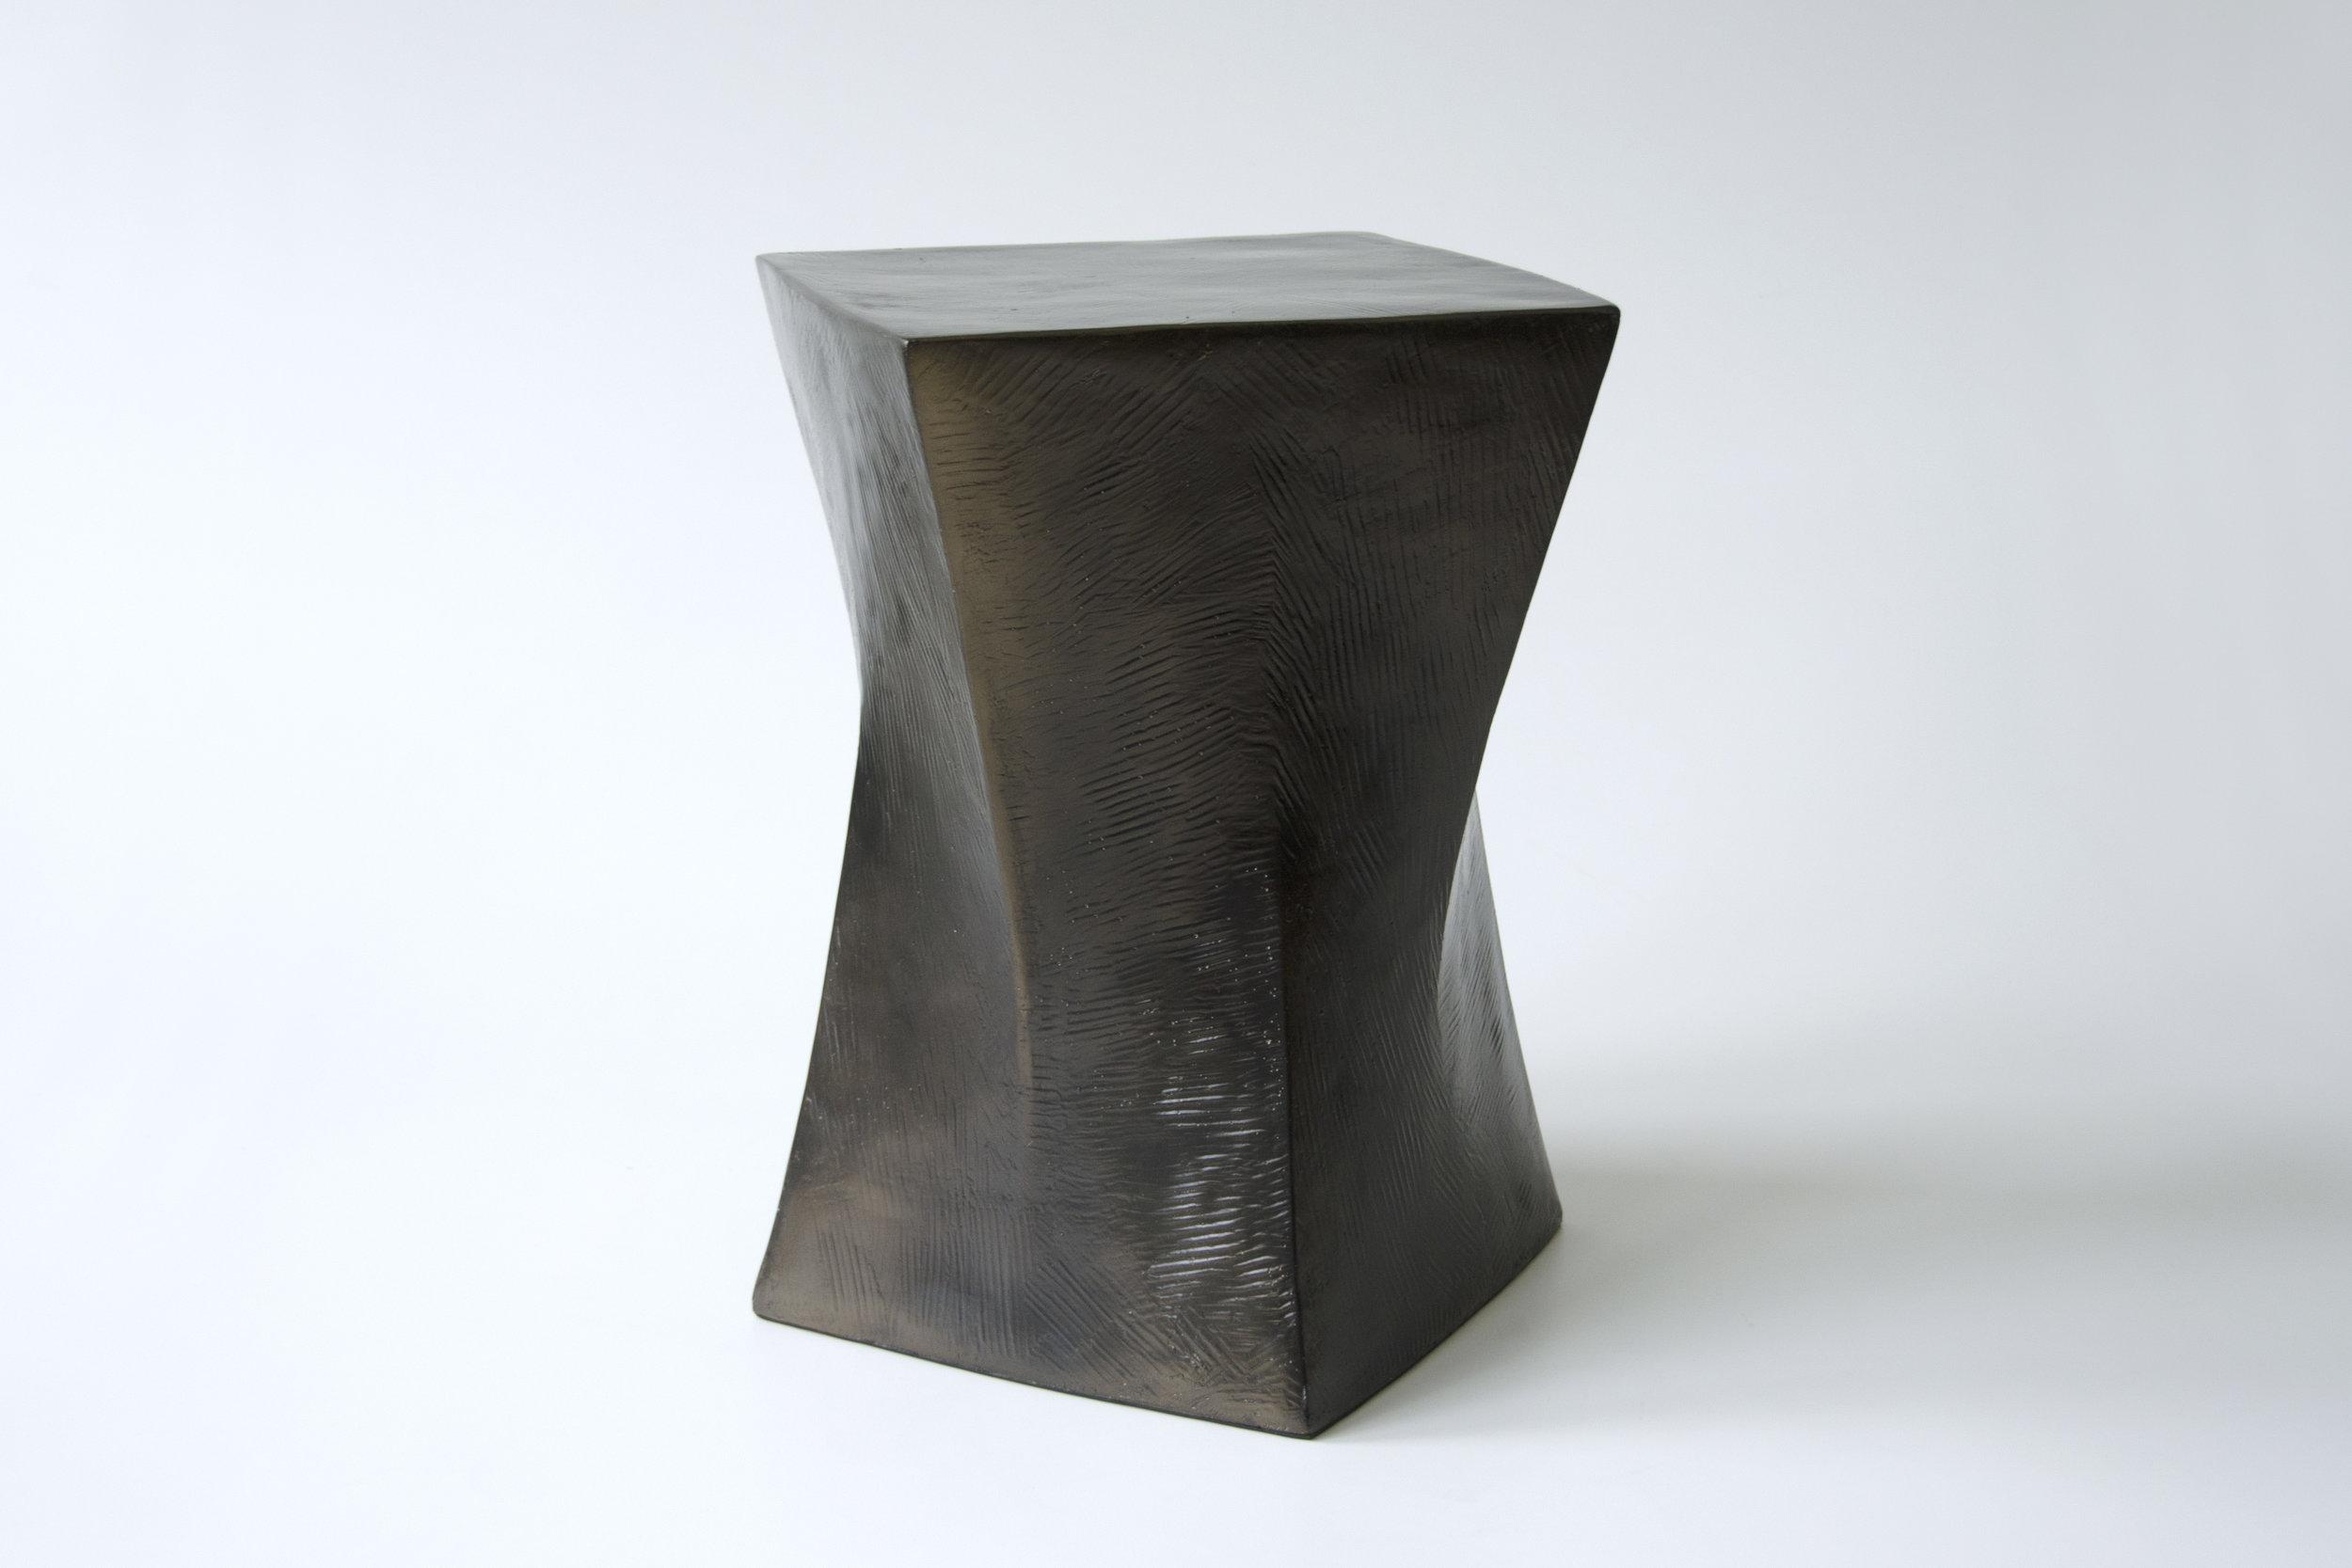 Squared Bronze 1 847.jpg